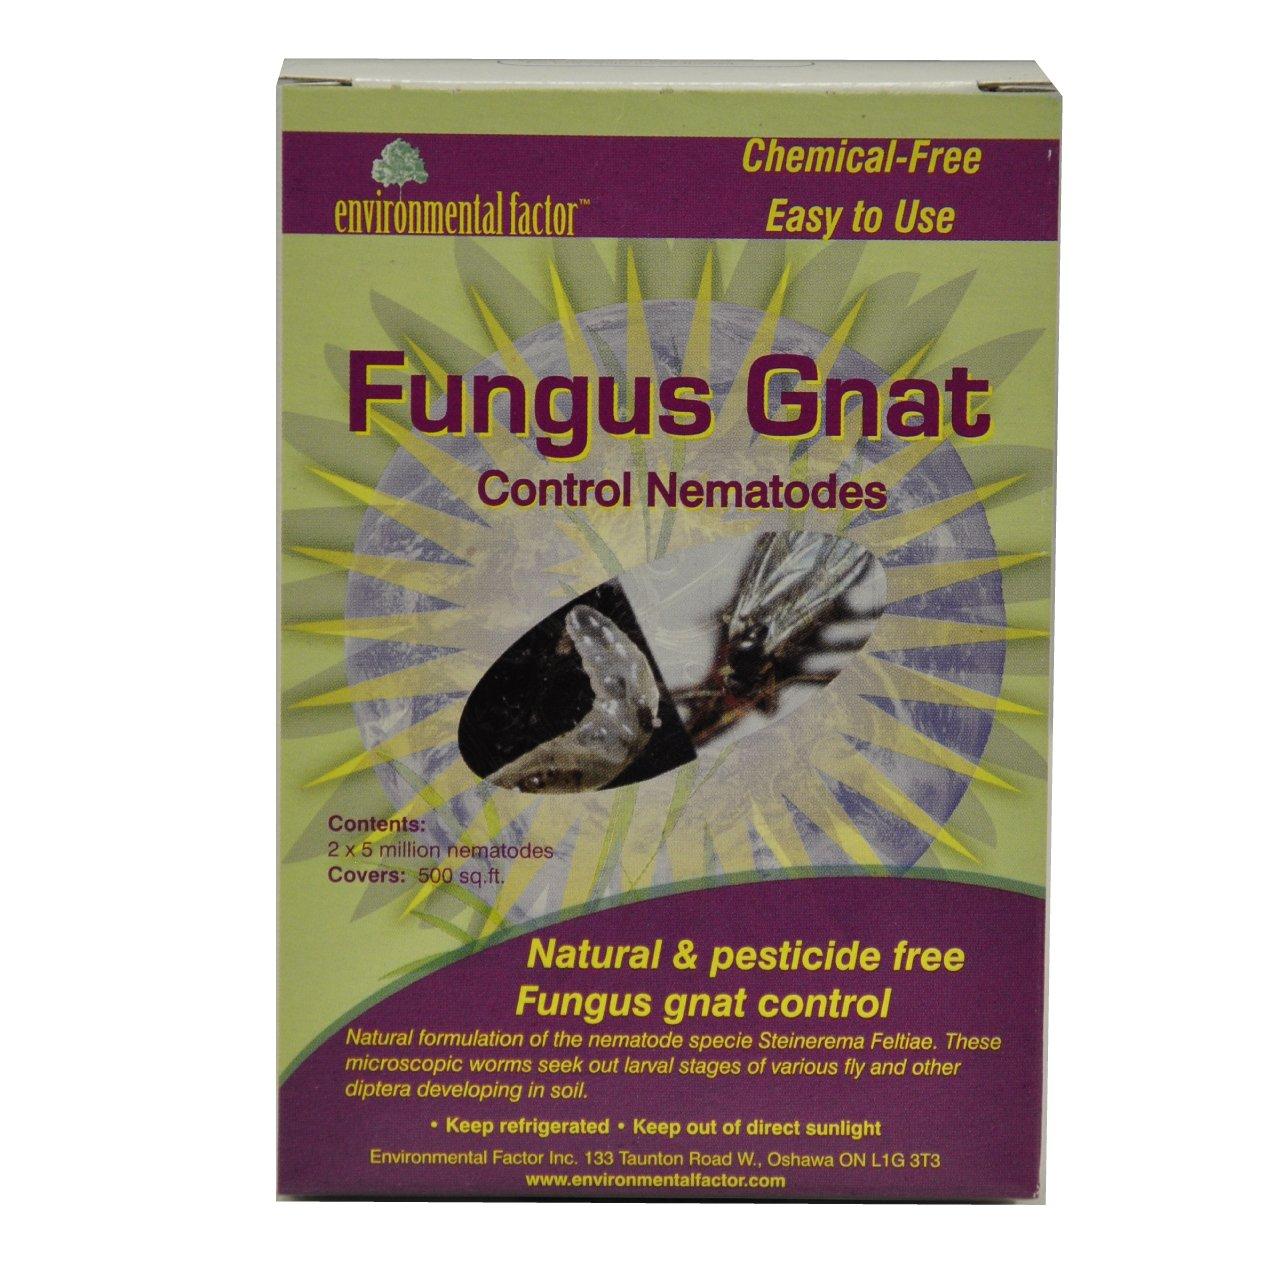 2 x 5 million beneficial nematodes nema globe for Beneficial nematodes for termites